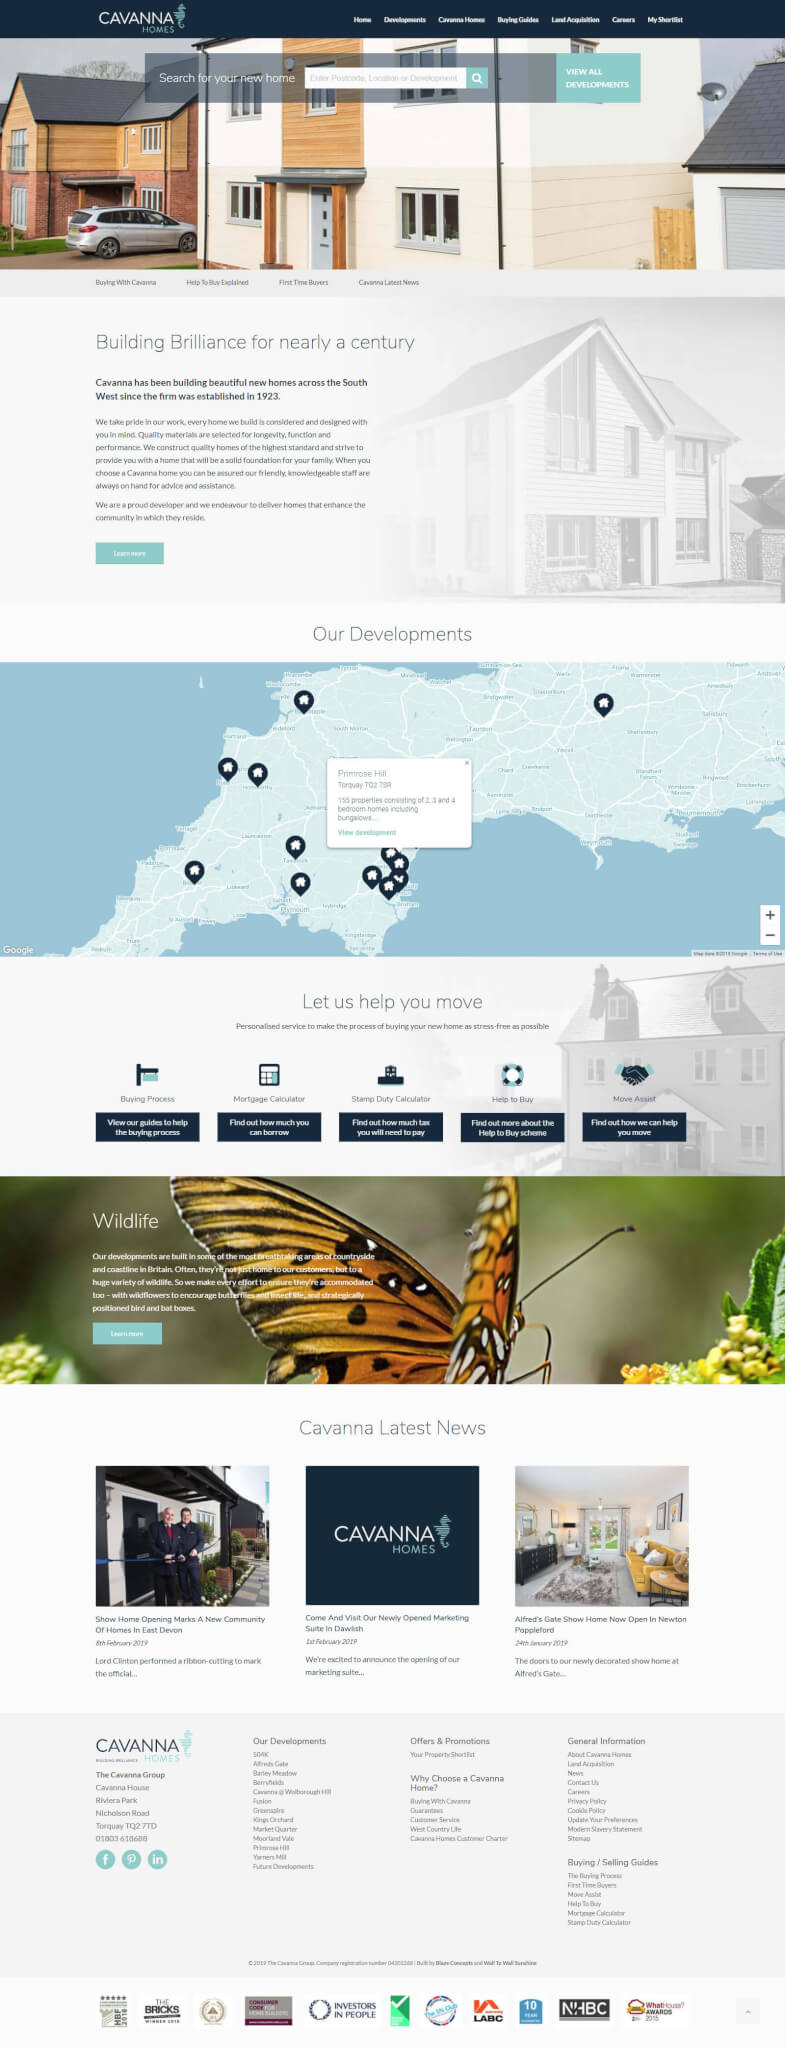 Cavanna Homes website 2019 design